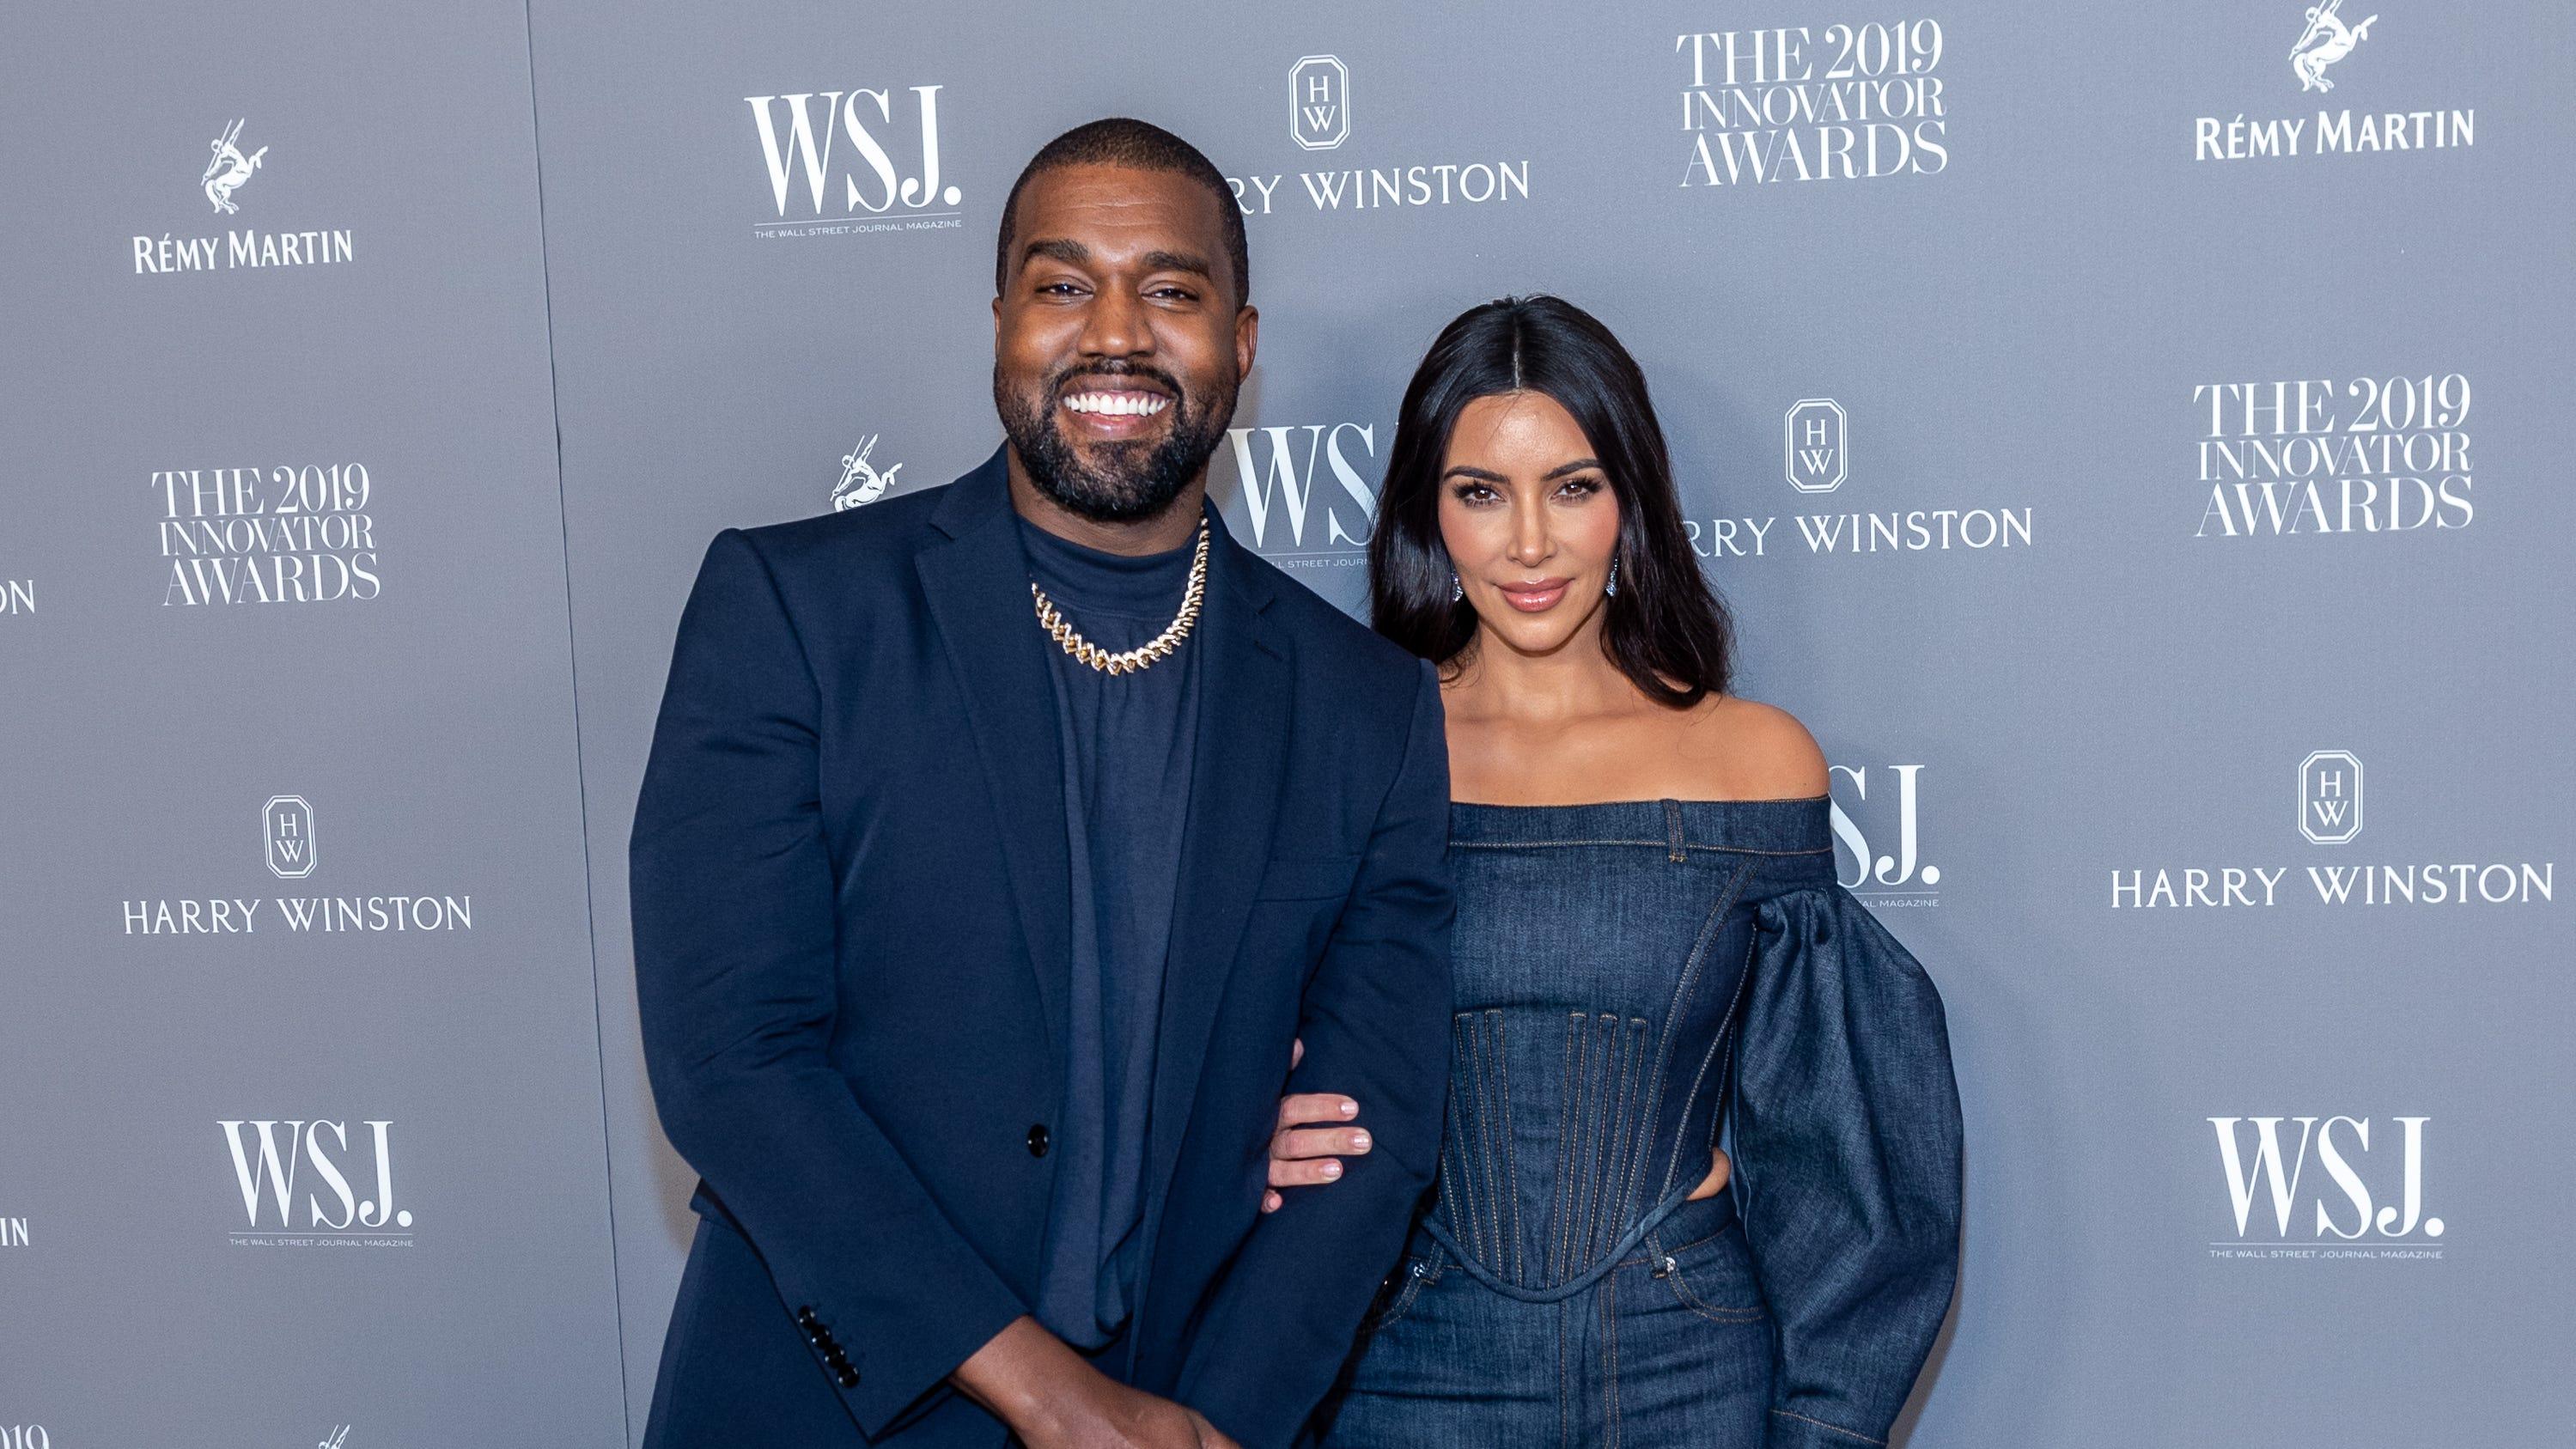 Kanye West gets warm 'happy birthday' from Kim Kardashian amid divorce: 'Love U for Life' - USA TODAY